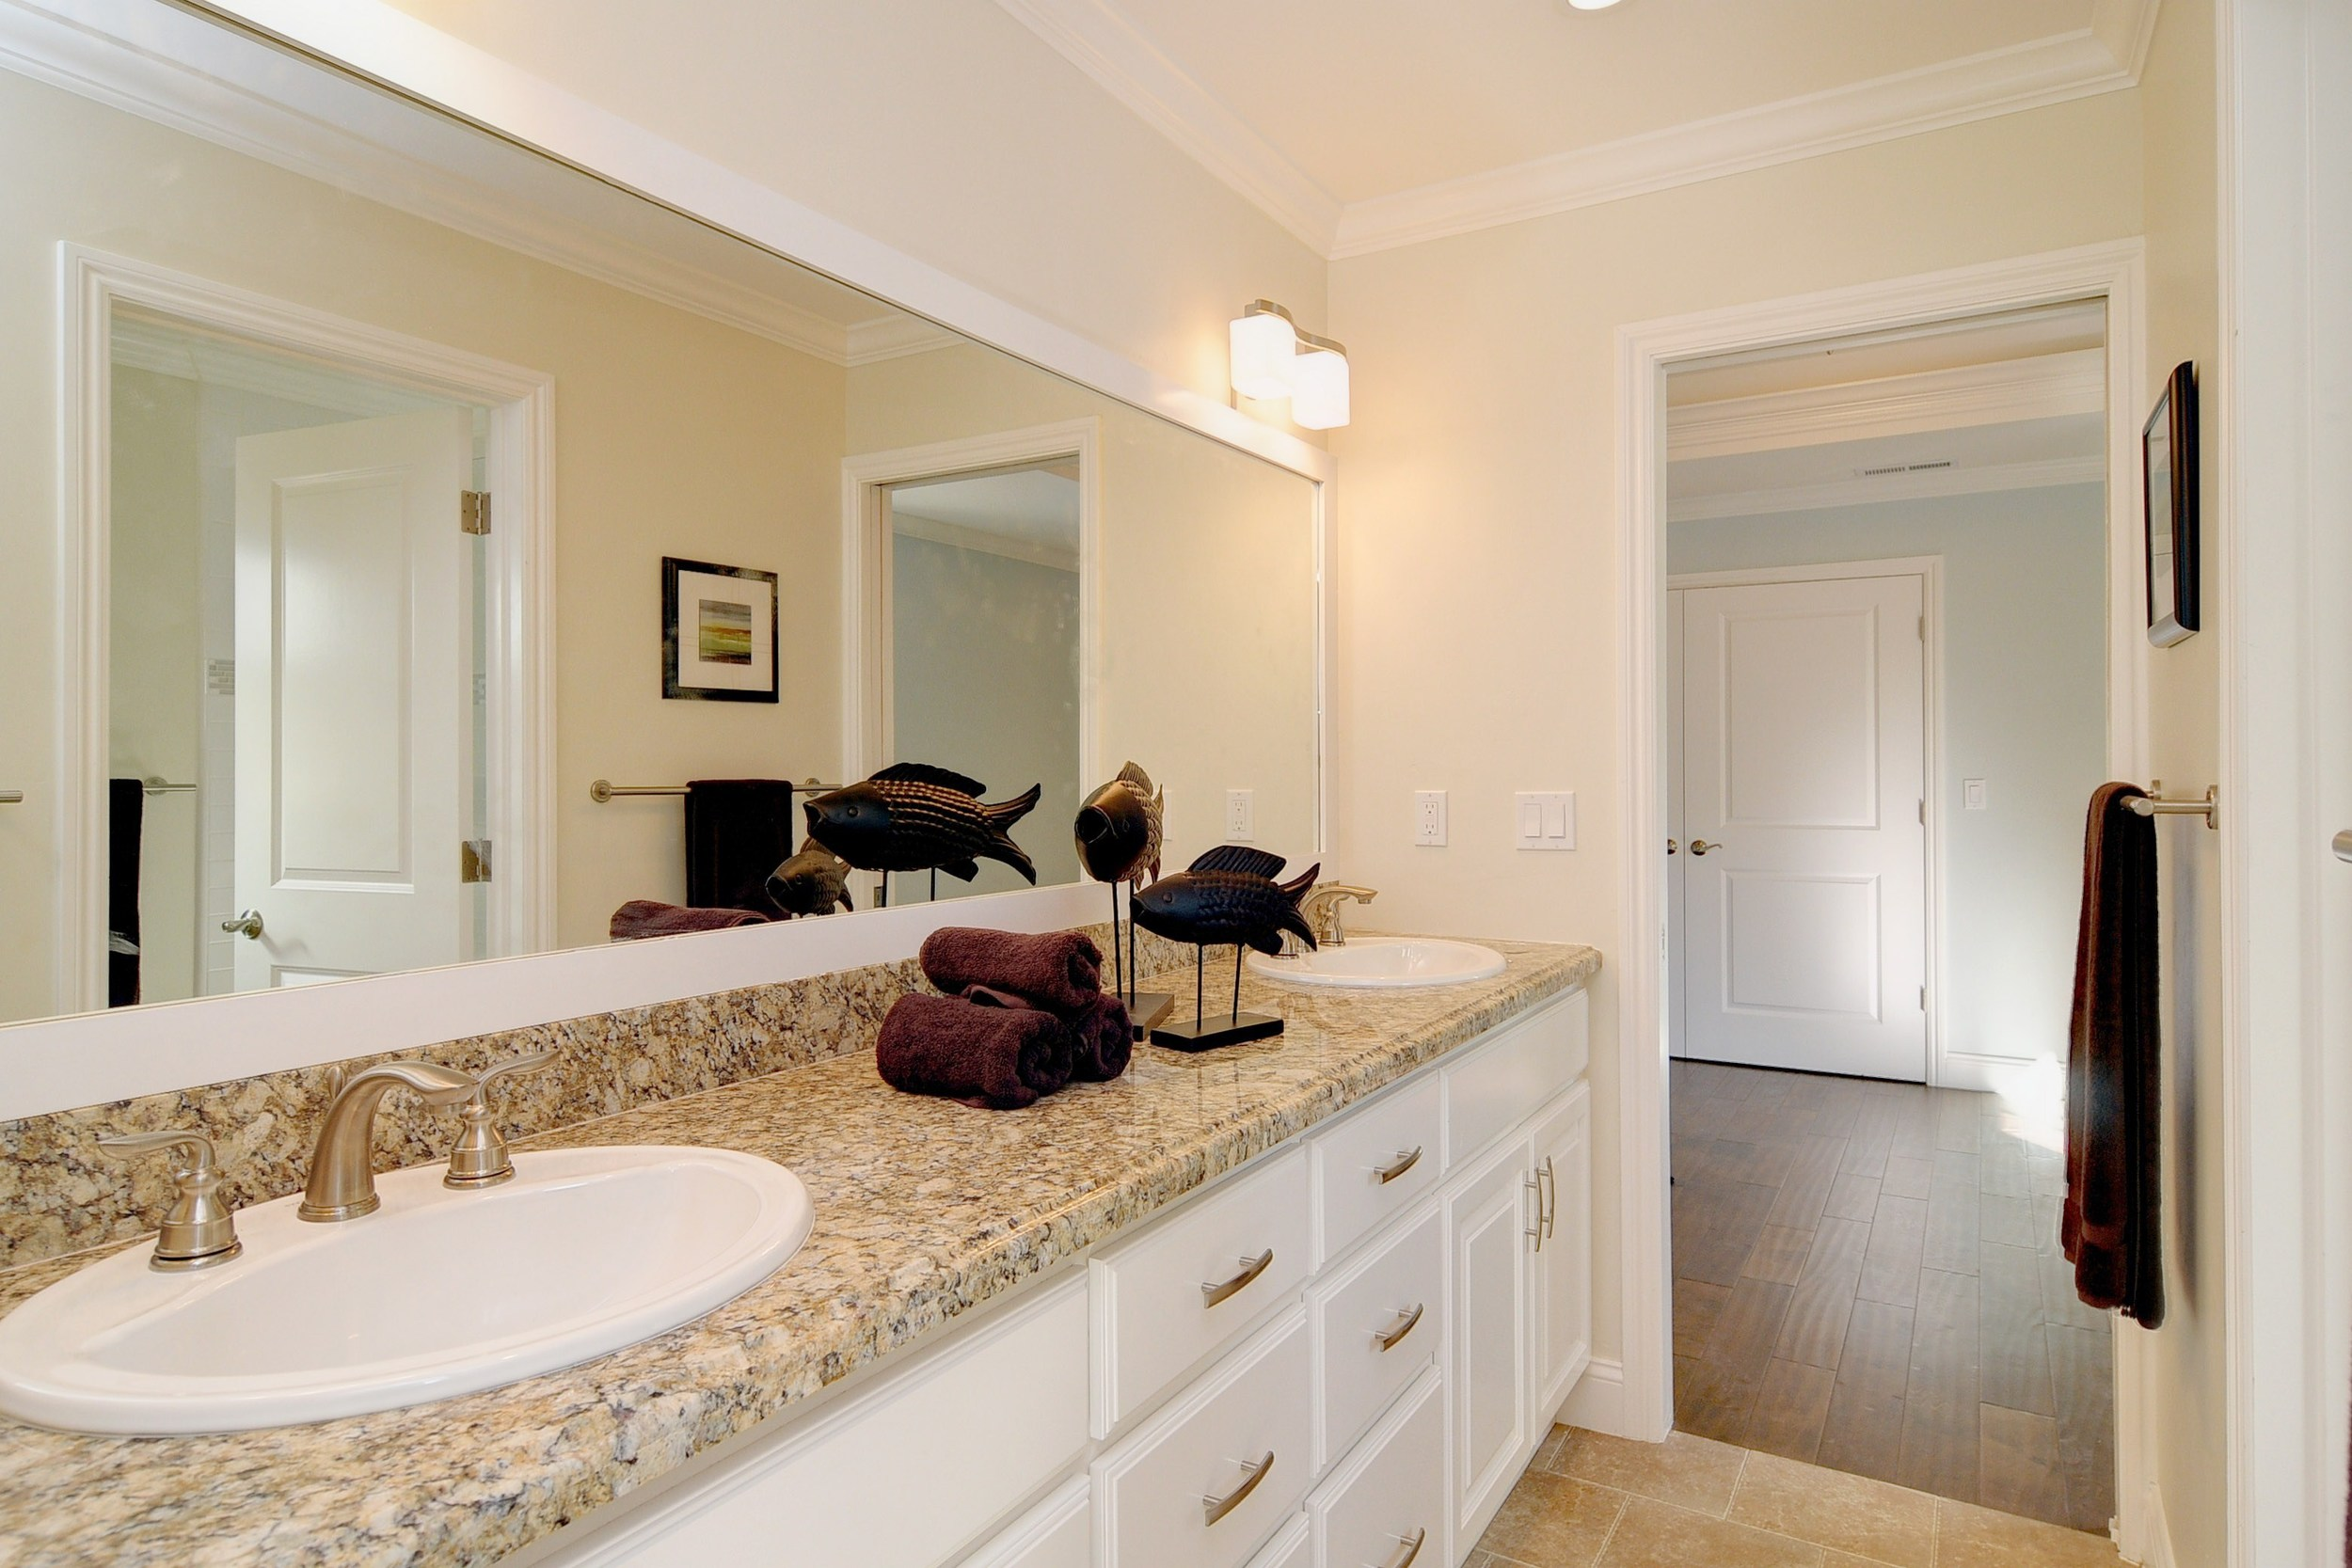 022_Bathroom.jpg